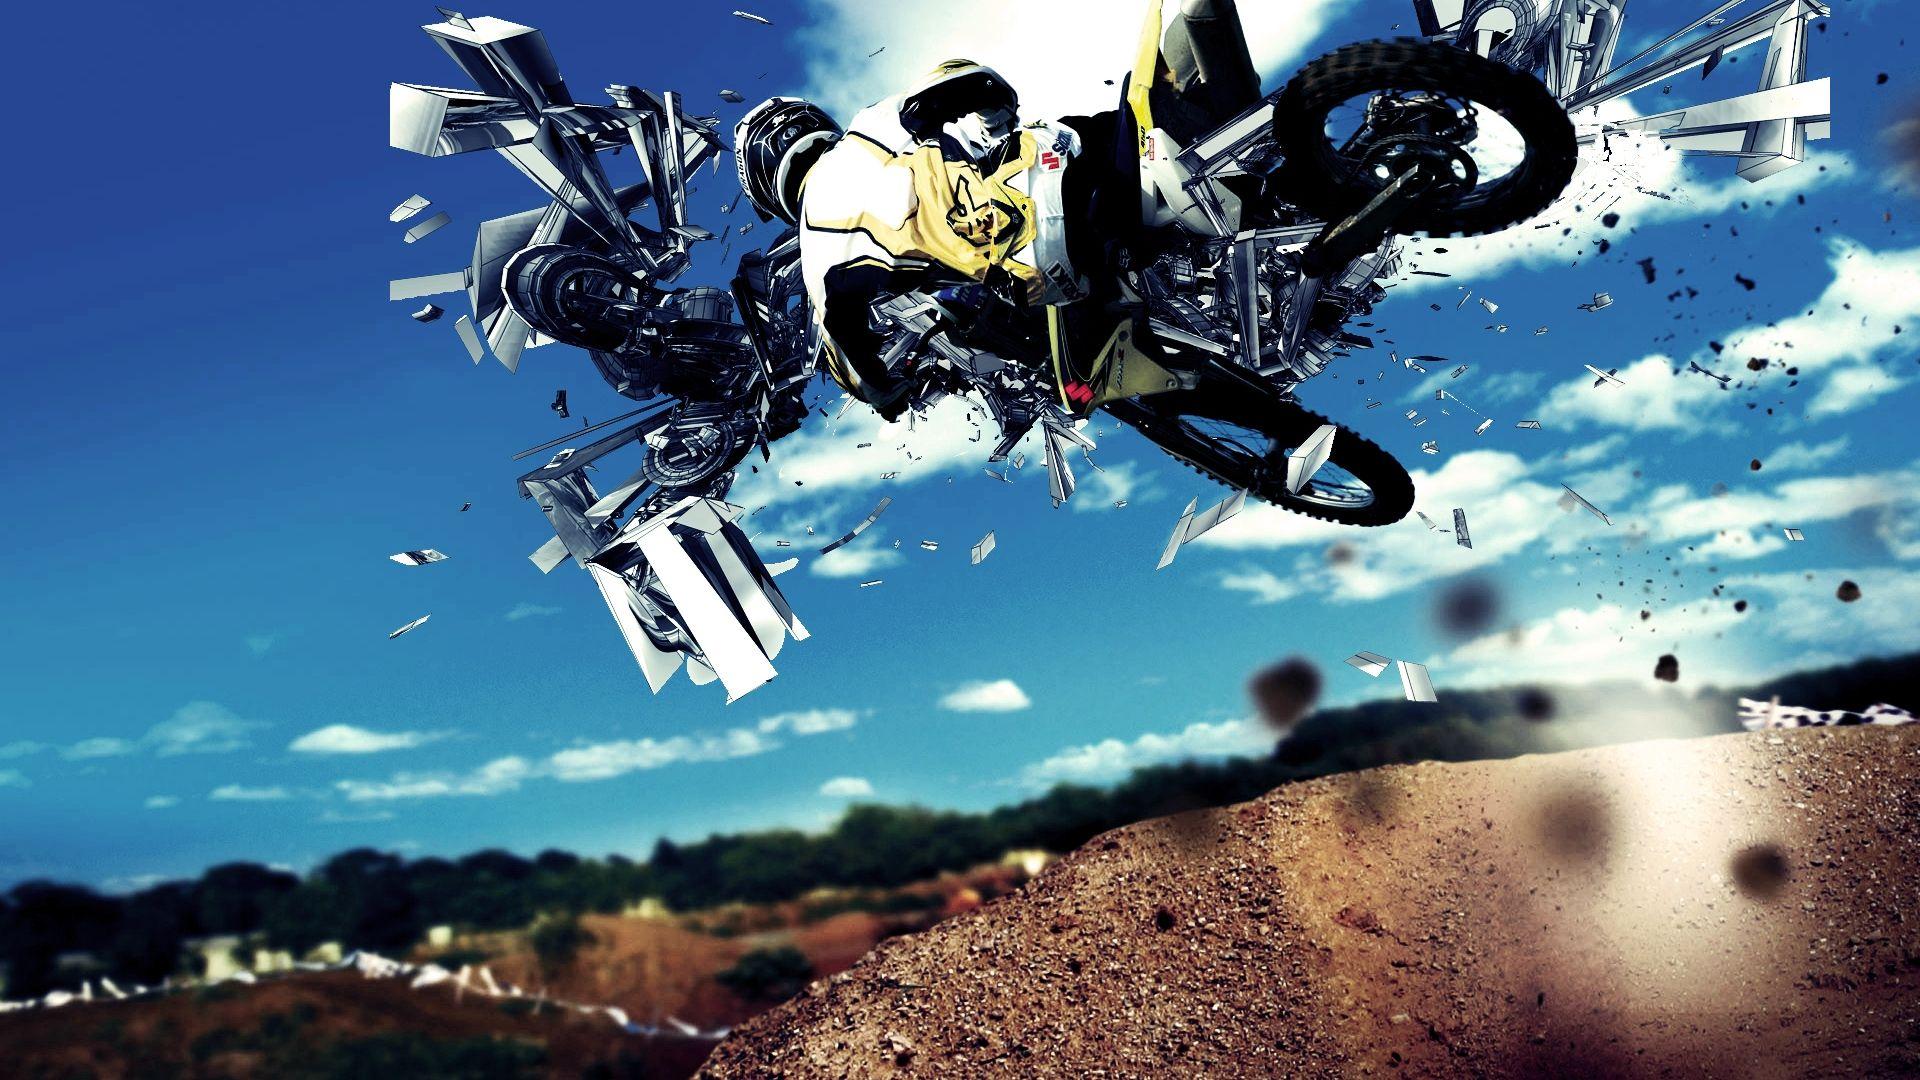 Motocross Wallpaper 1920x1080